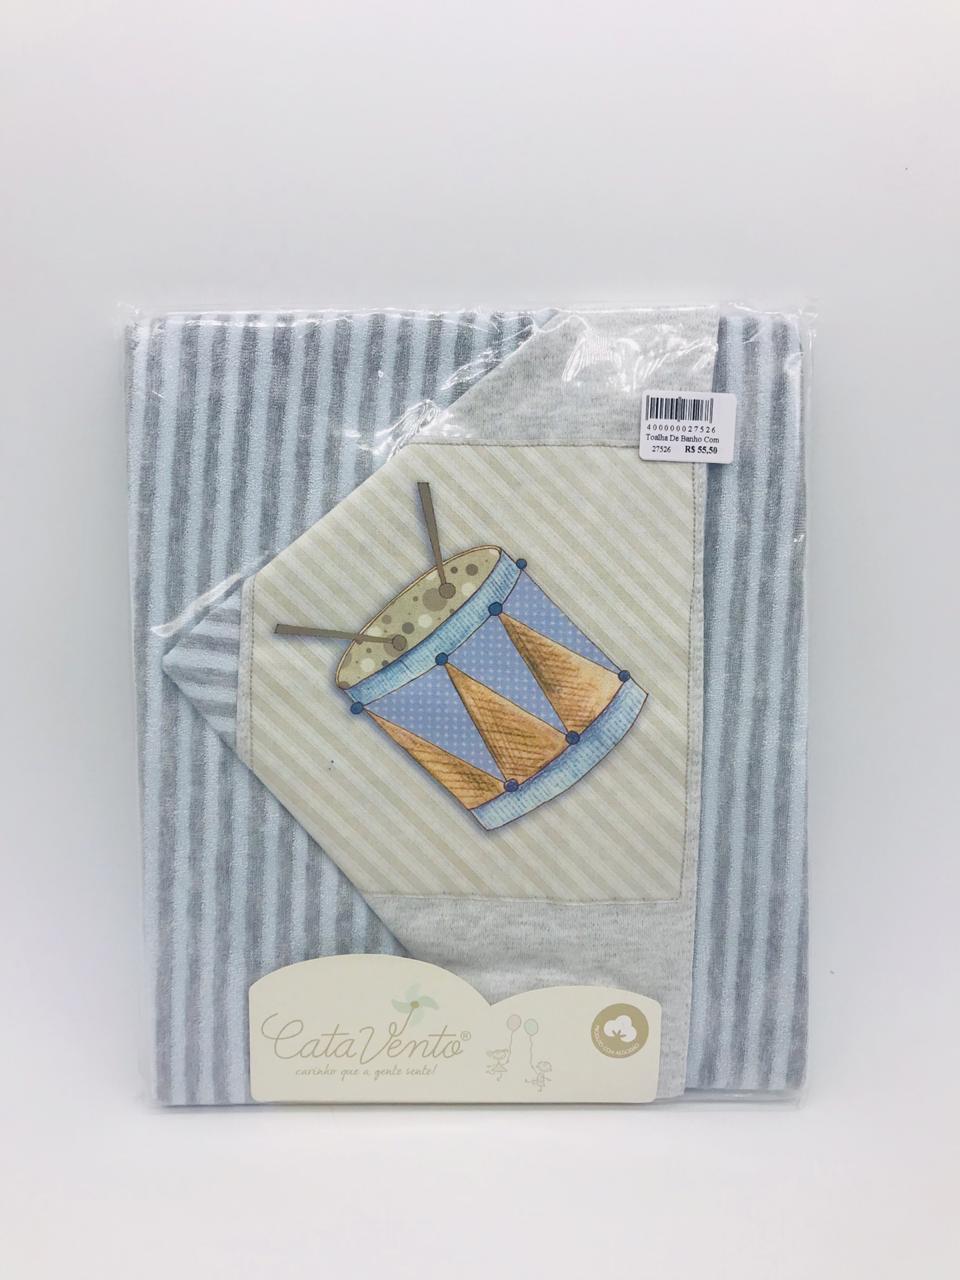 Toalha de Banho Fralda Plush Azul Tambor - Catavento Ref 021